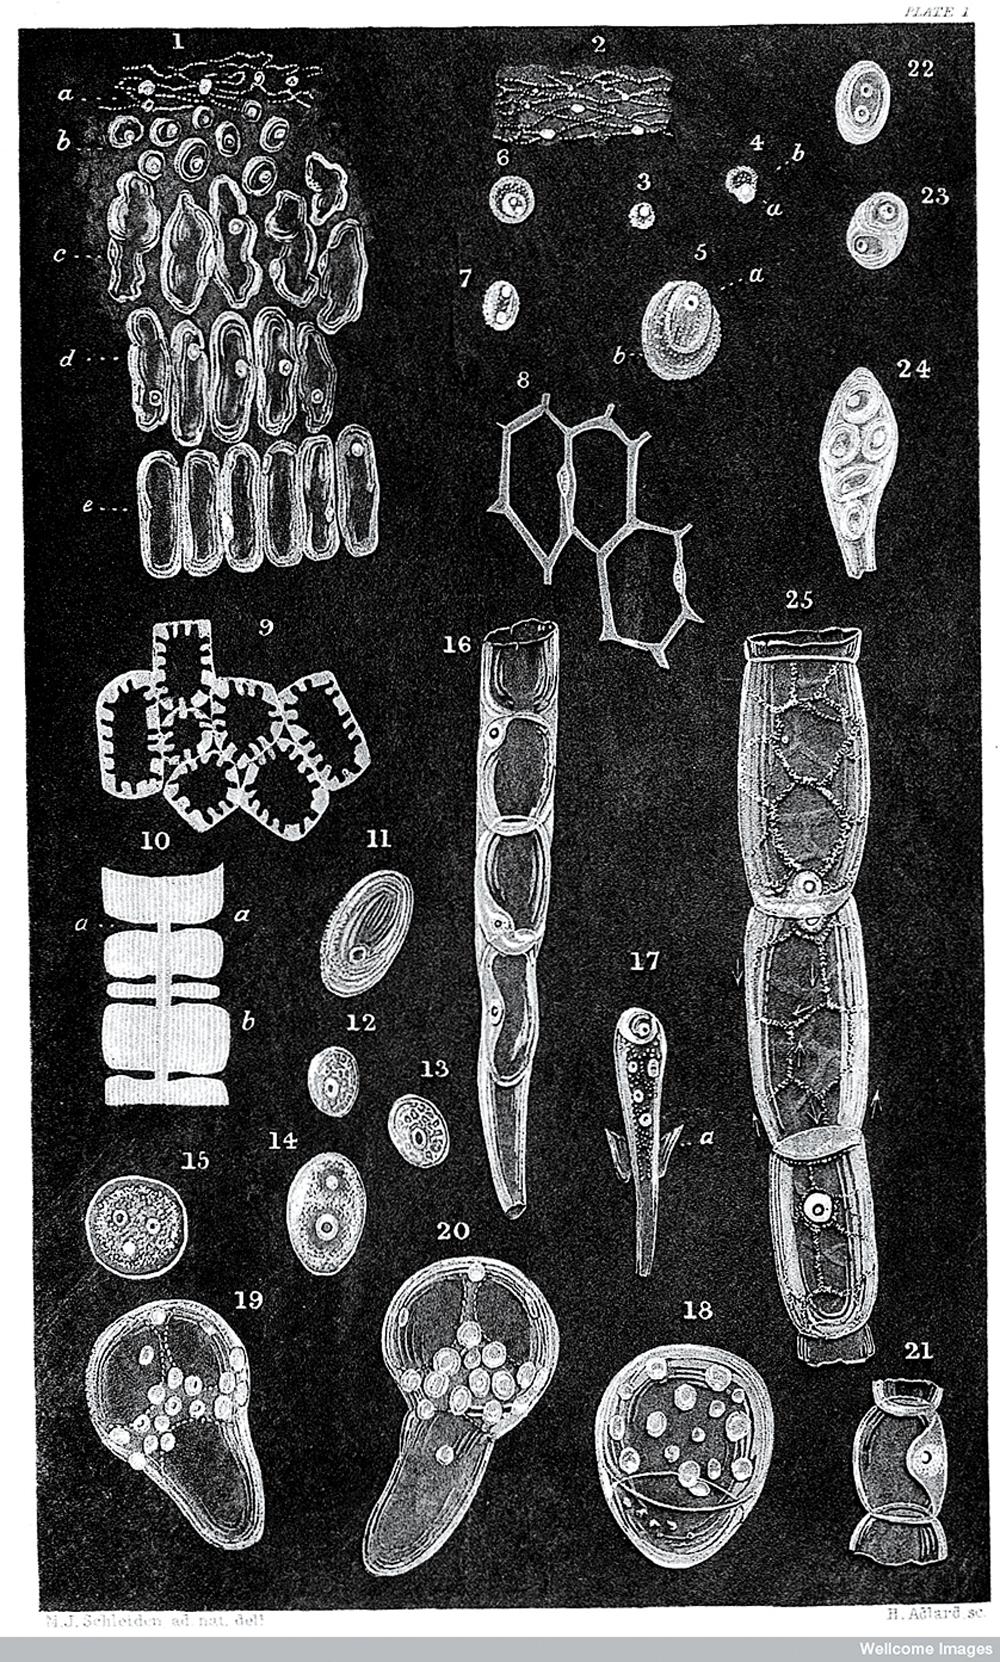 Sketches of animal cells (Theodor Schwann, 1839).